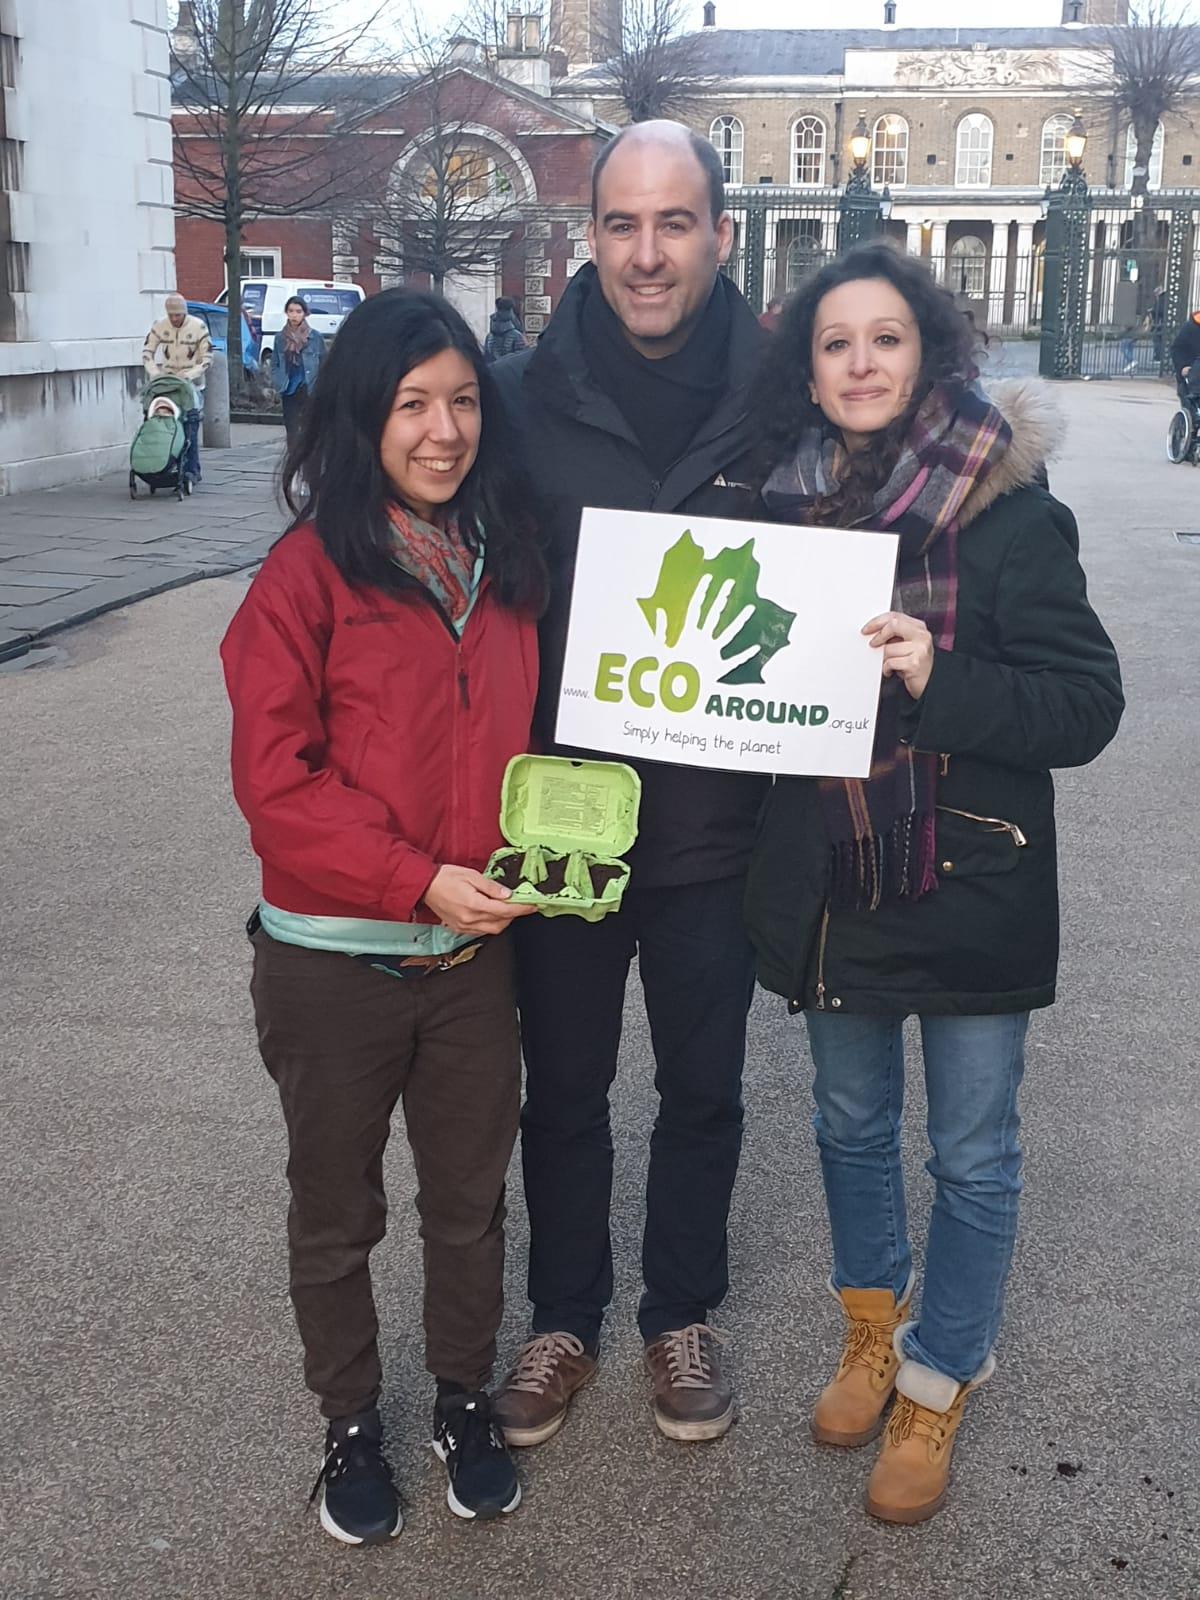 Eco Around team, Ludo, Jon and Ellie